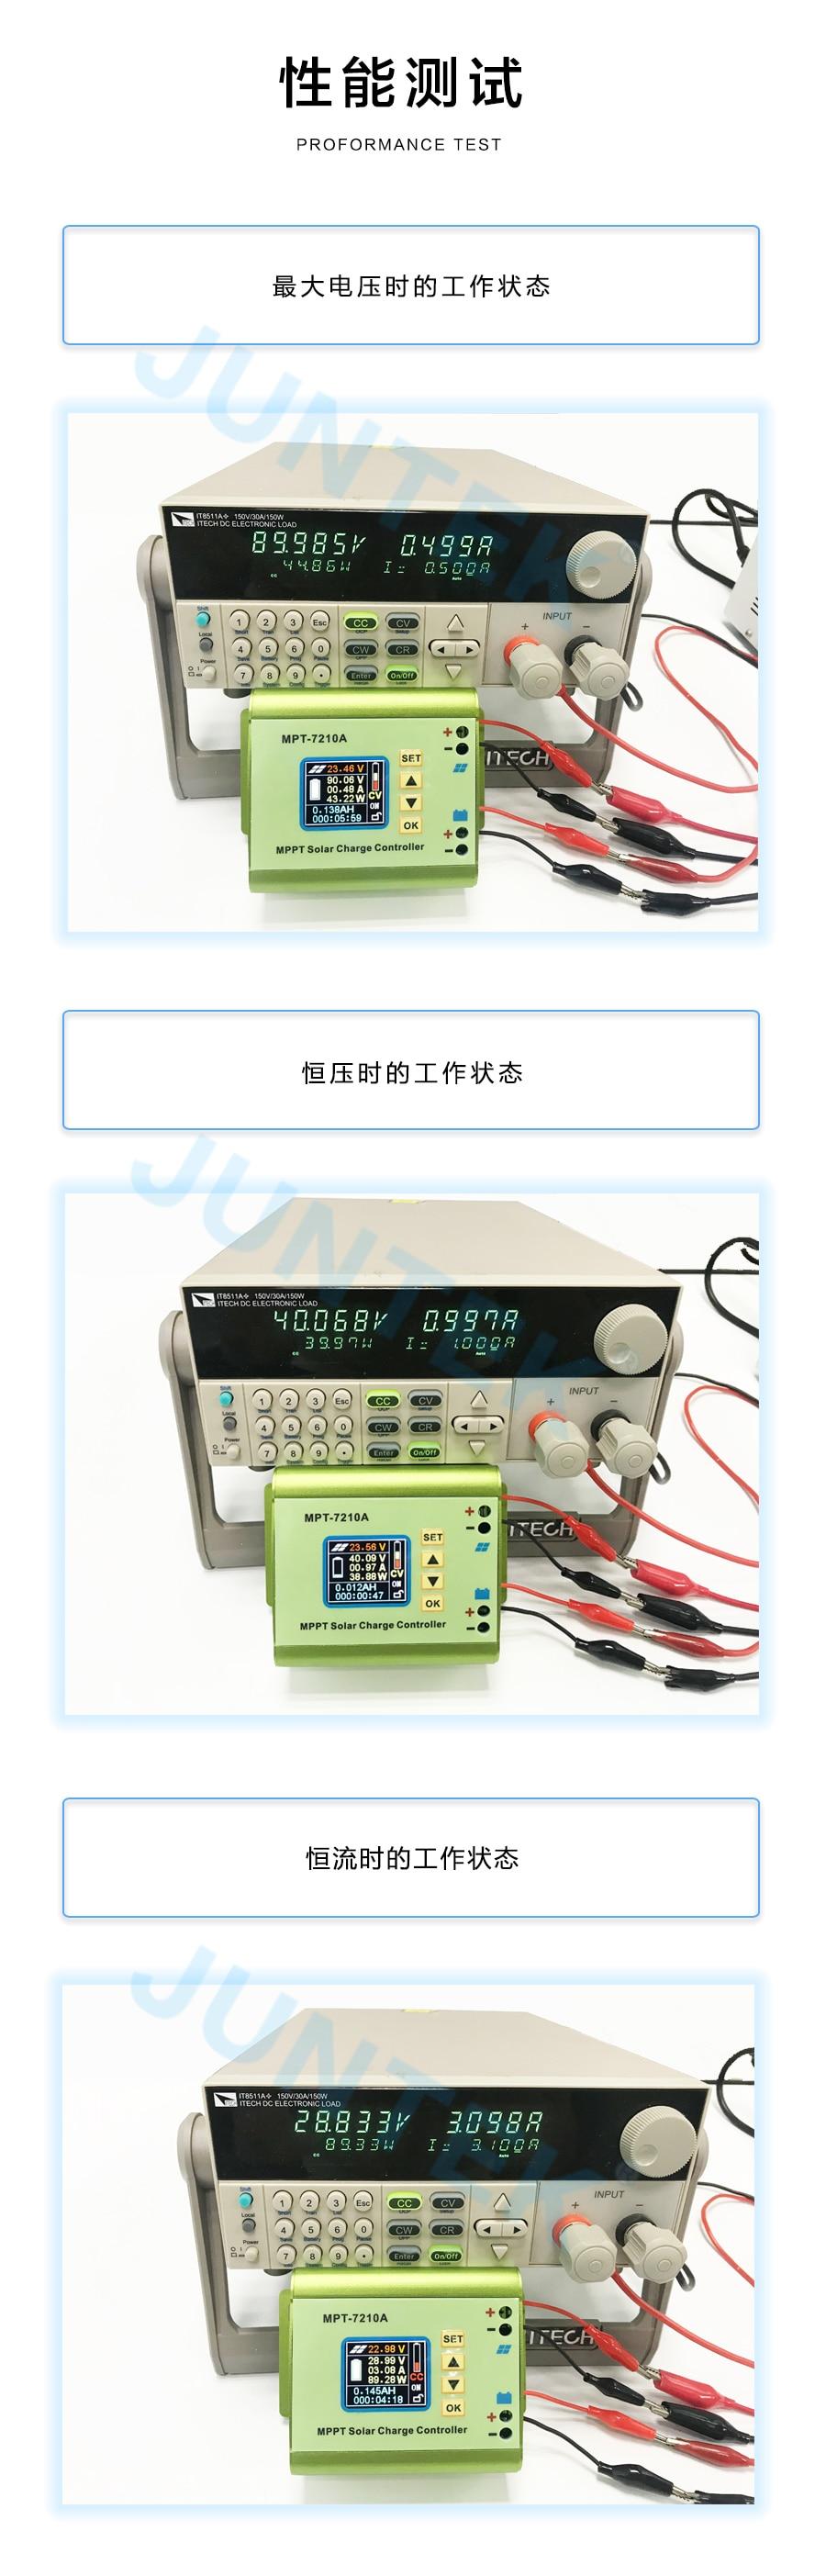 Mppt Солнечный контроллер напряжение Цифровой амперметр Boost модуль 24 В до 72 батарея зарядное устройство